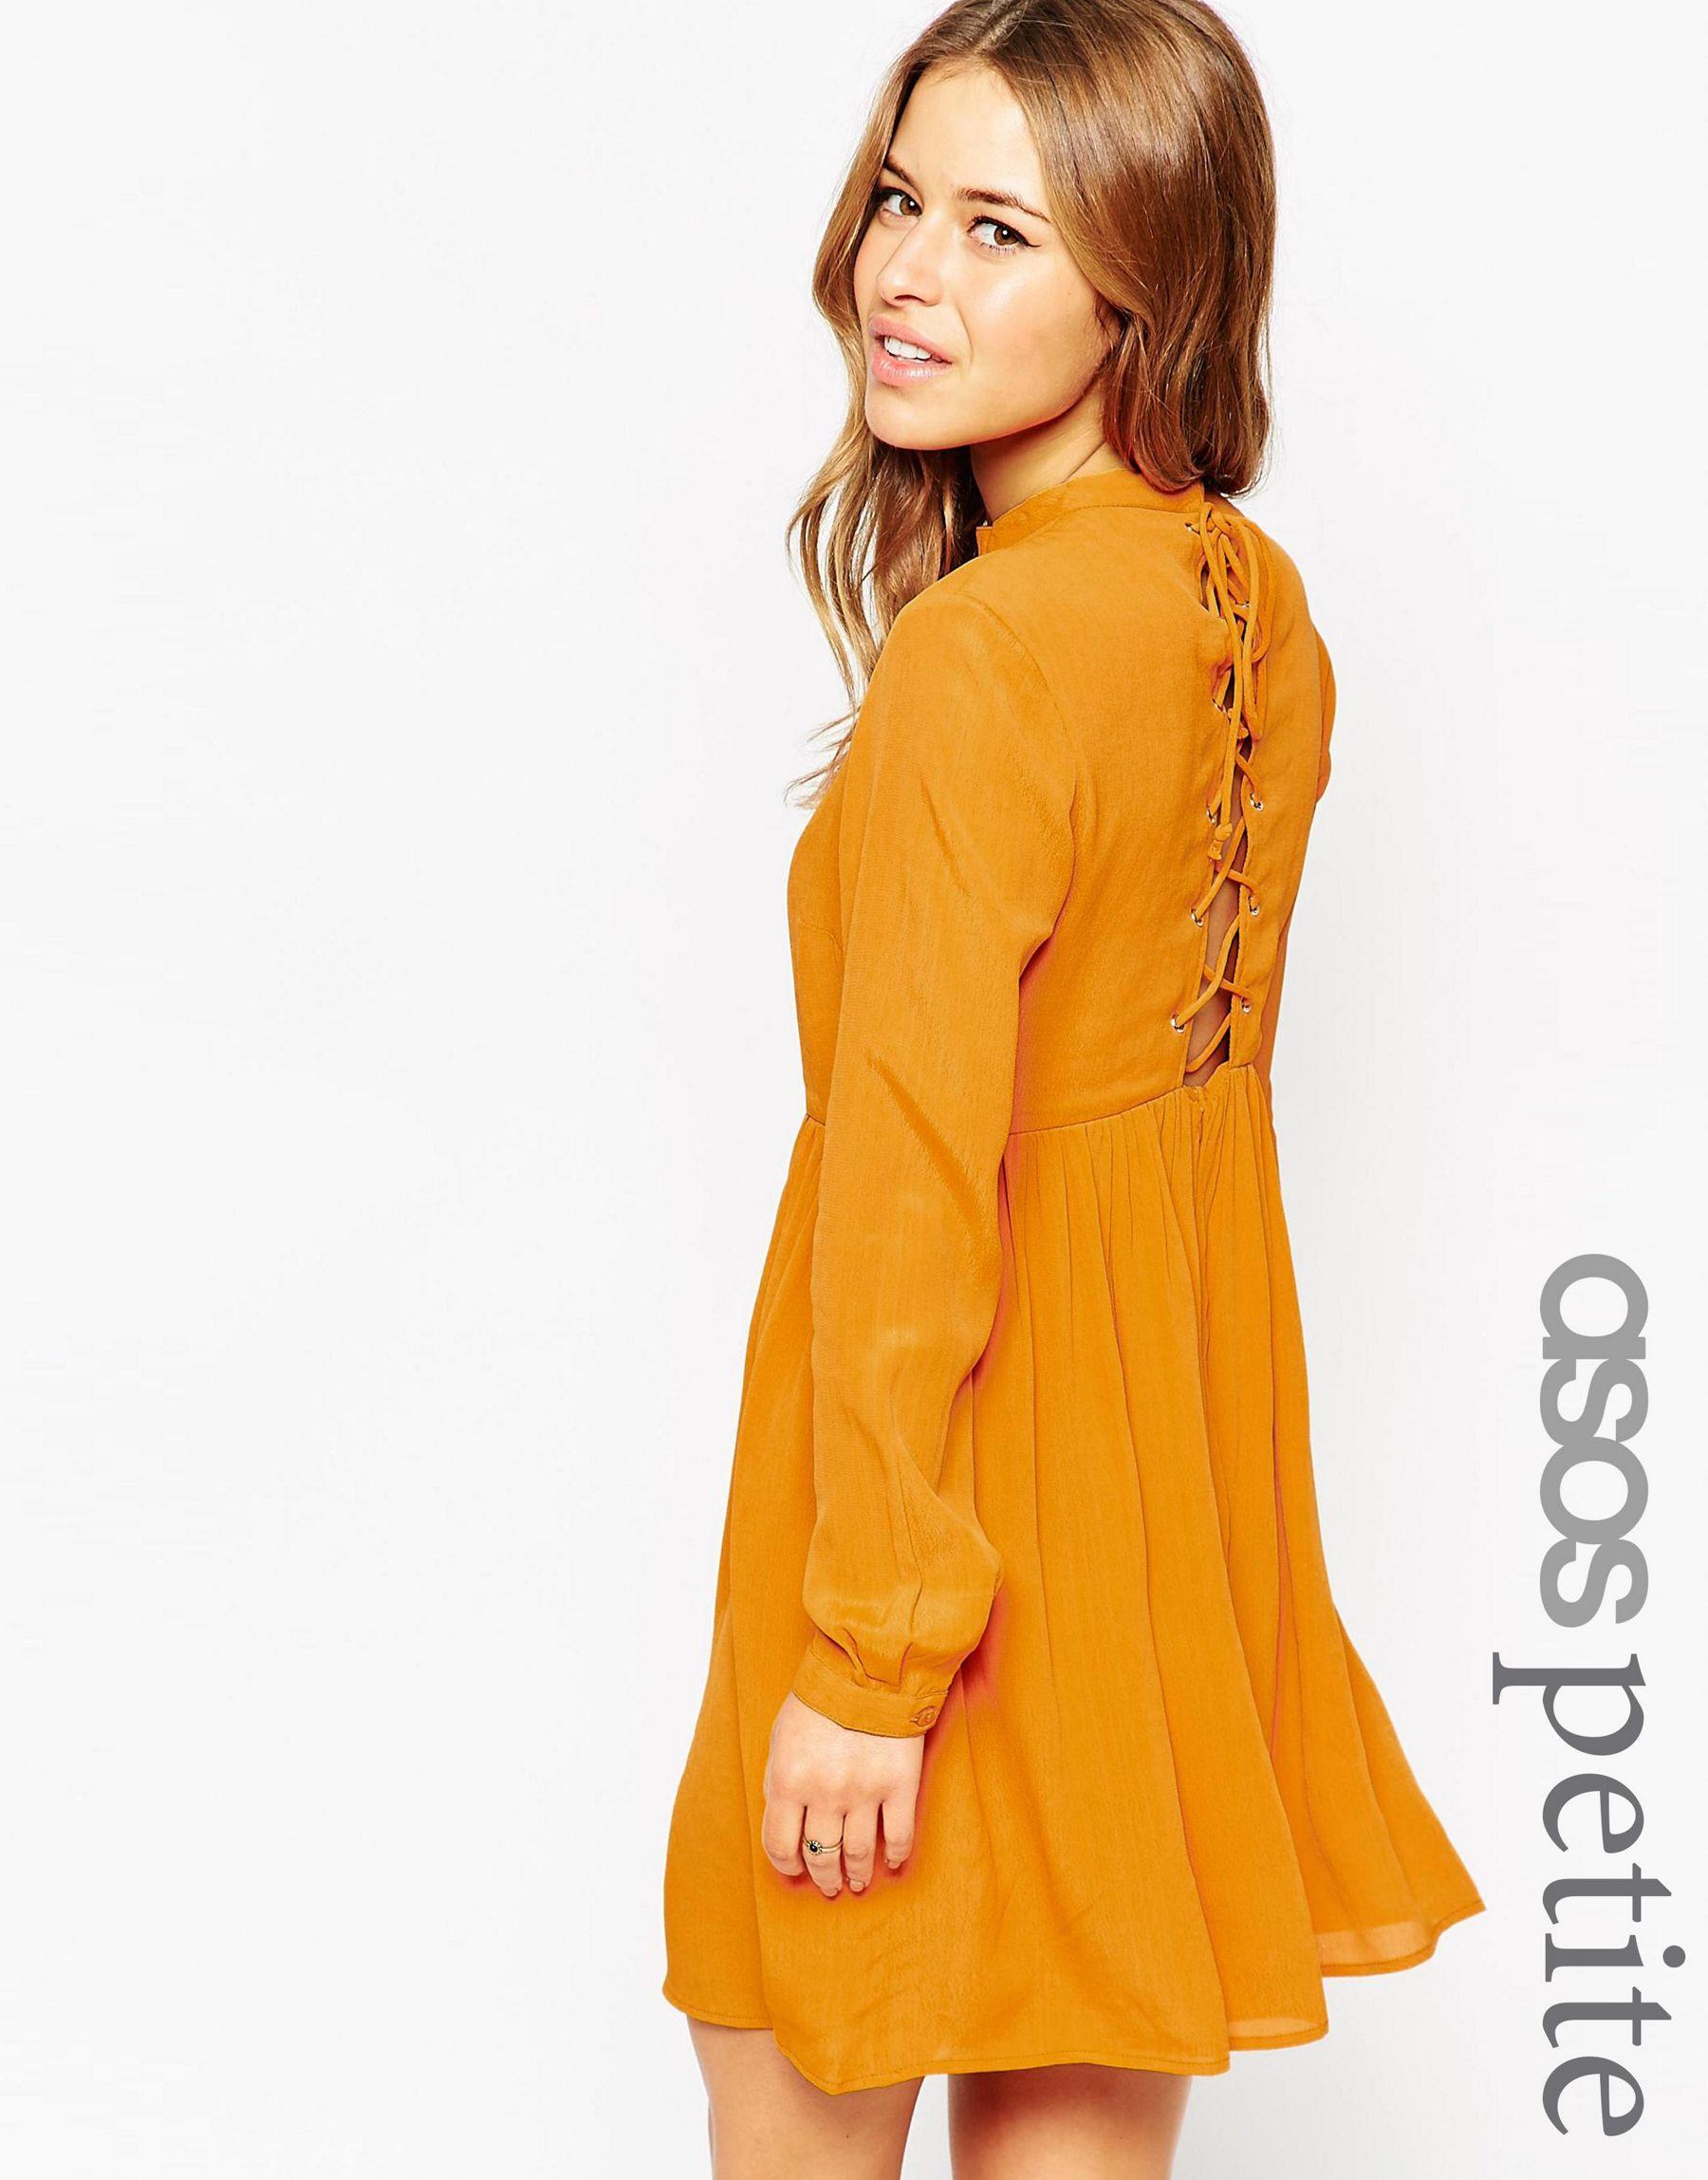 4e9e5ecc5b Asos Petite Skater Dress With Lace Up Back in Purple - Lyst